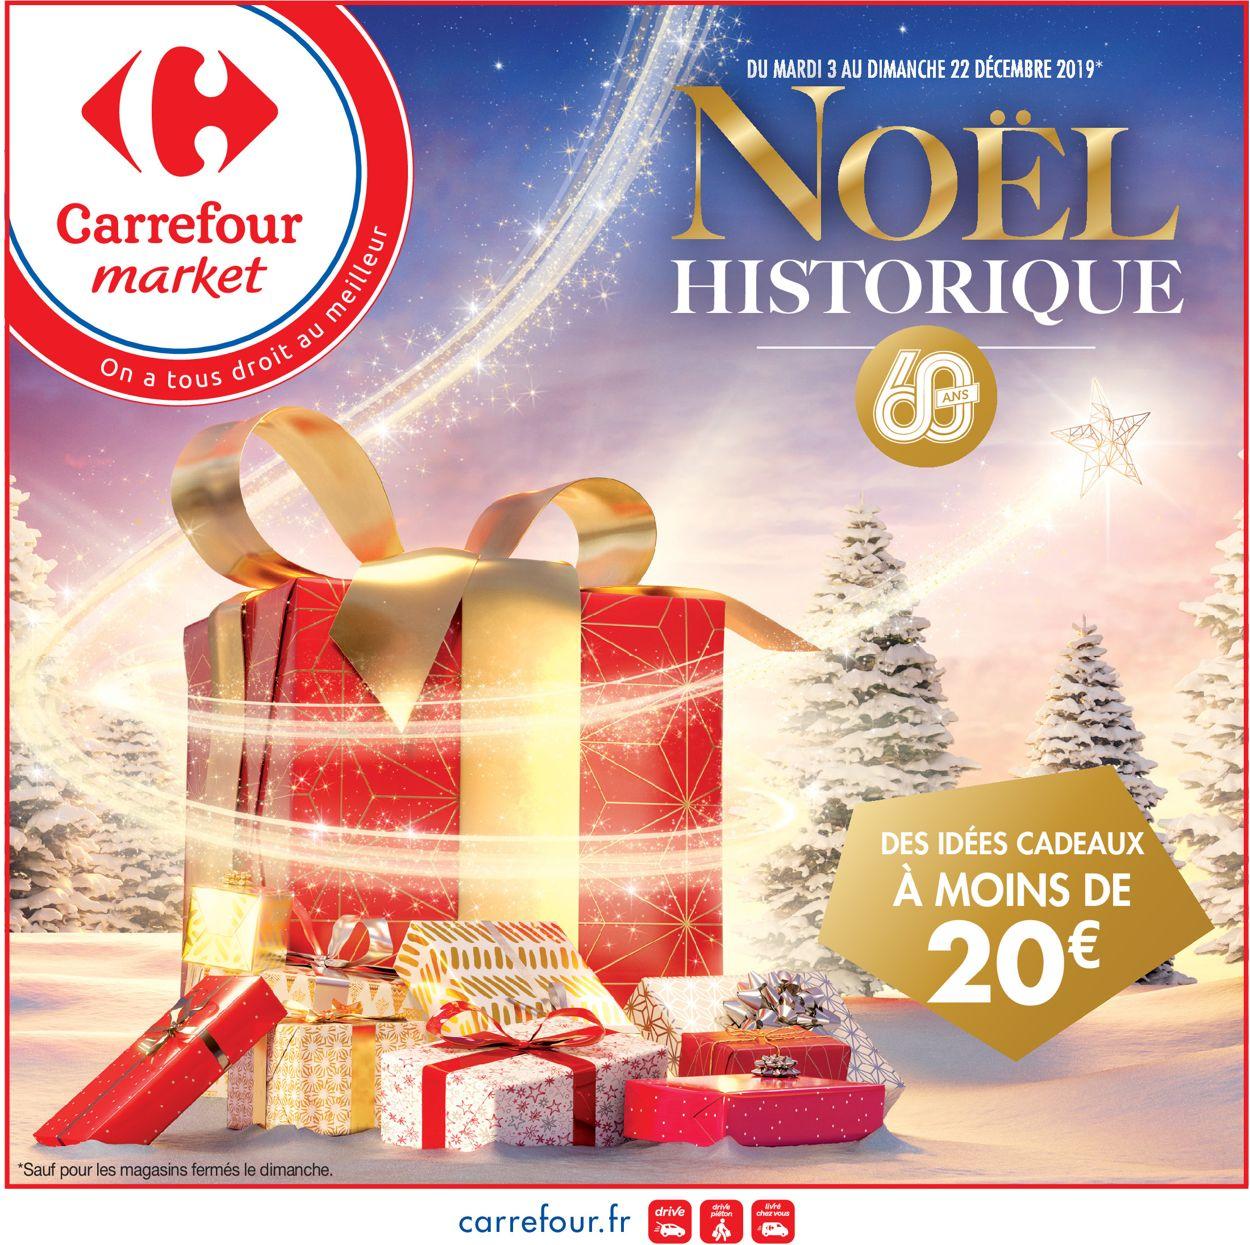 Carrefour - catalogue de Noël 2019 Catalogue - 03.12-22.12.2019